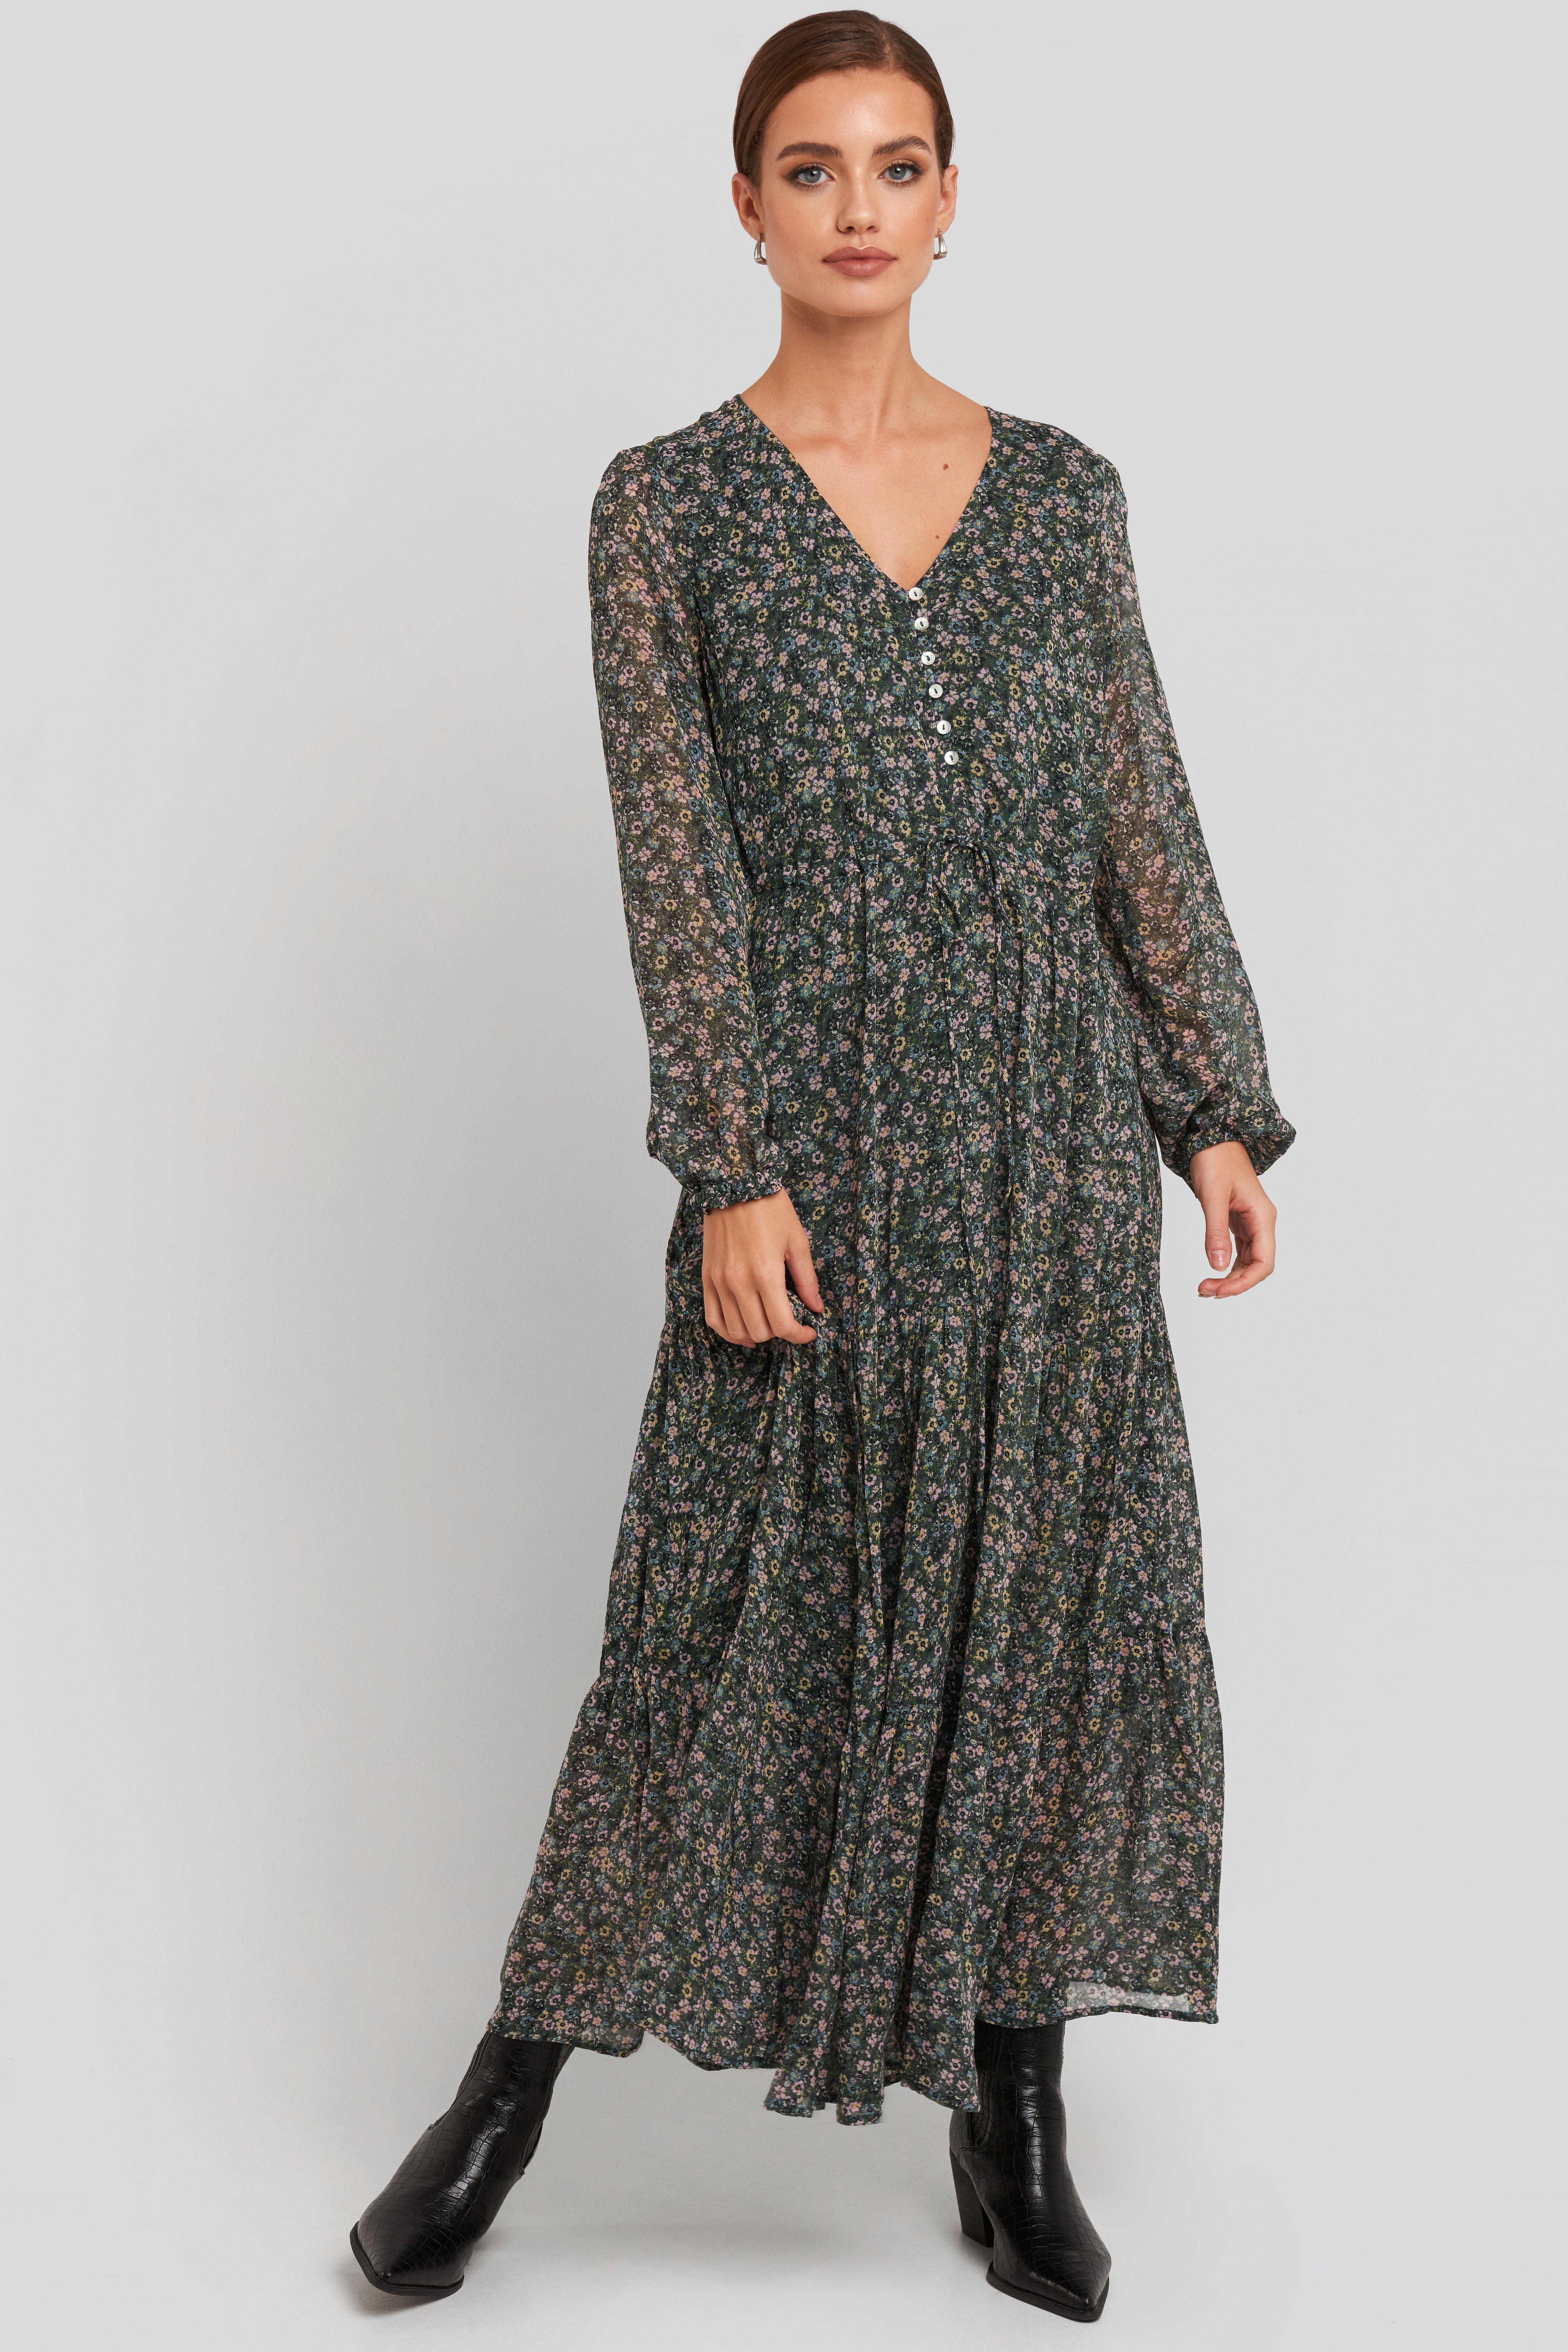 Liberty Dress Grün in 2020 | Modestil, Kleid mit ärmel ...